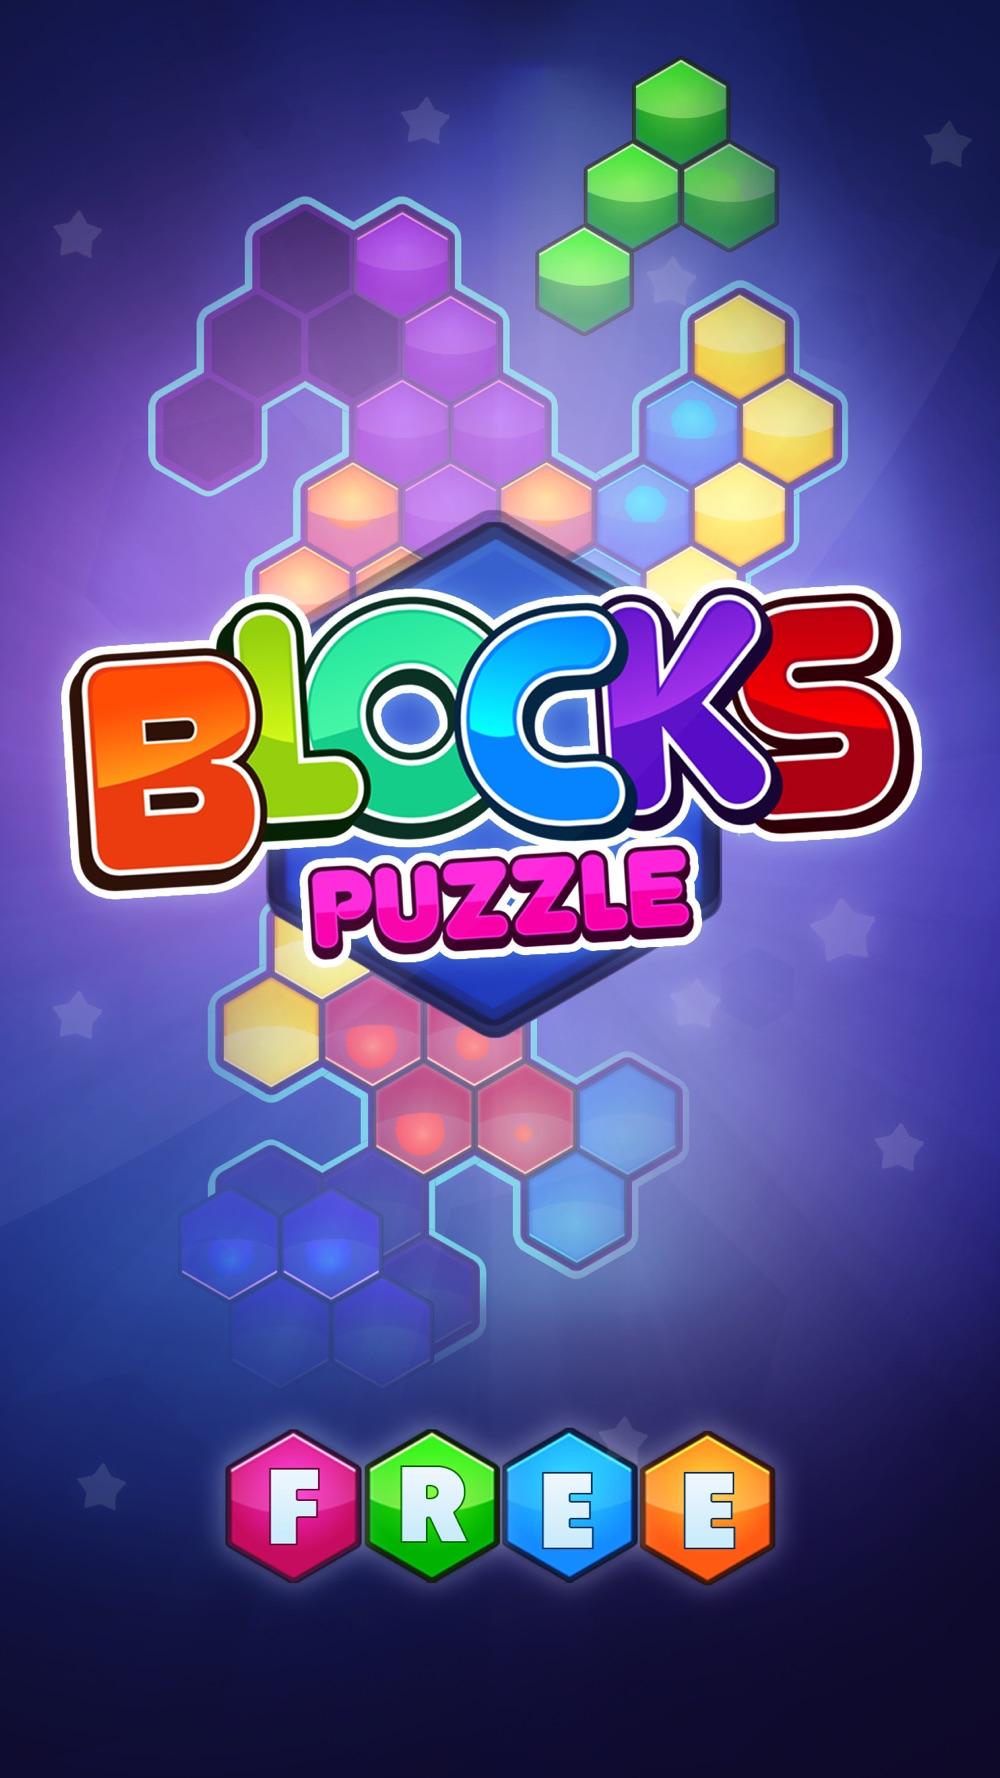 Blocks Puzzle – Hexagon Game Cheat Codes